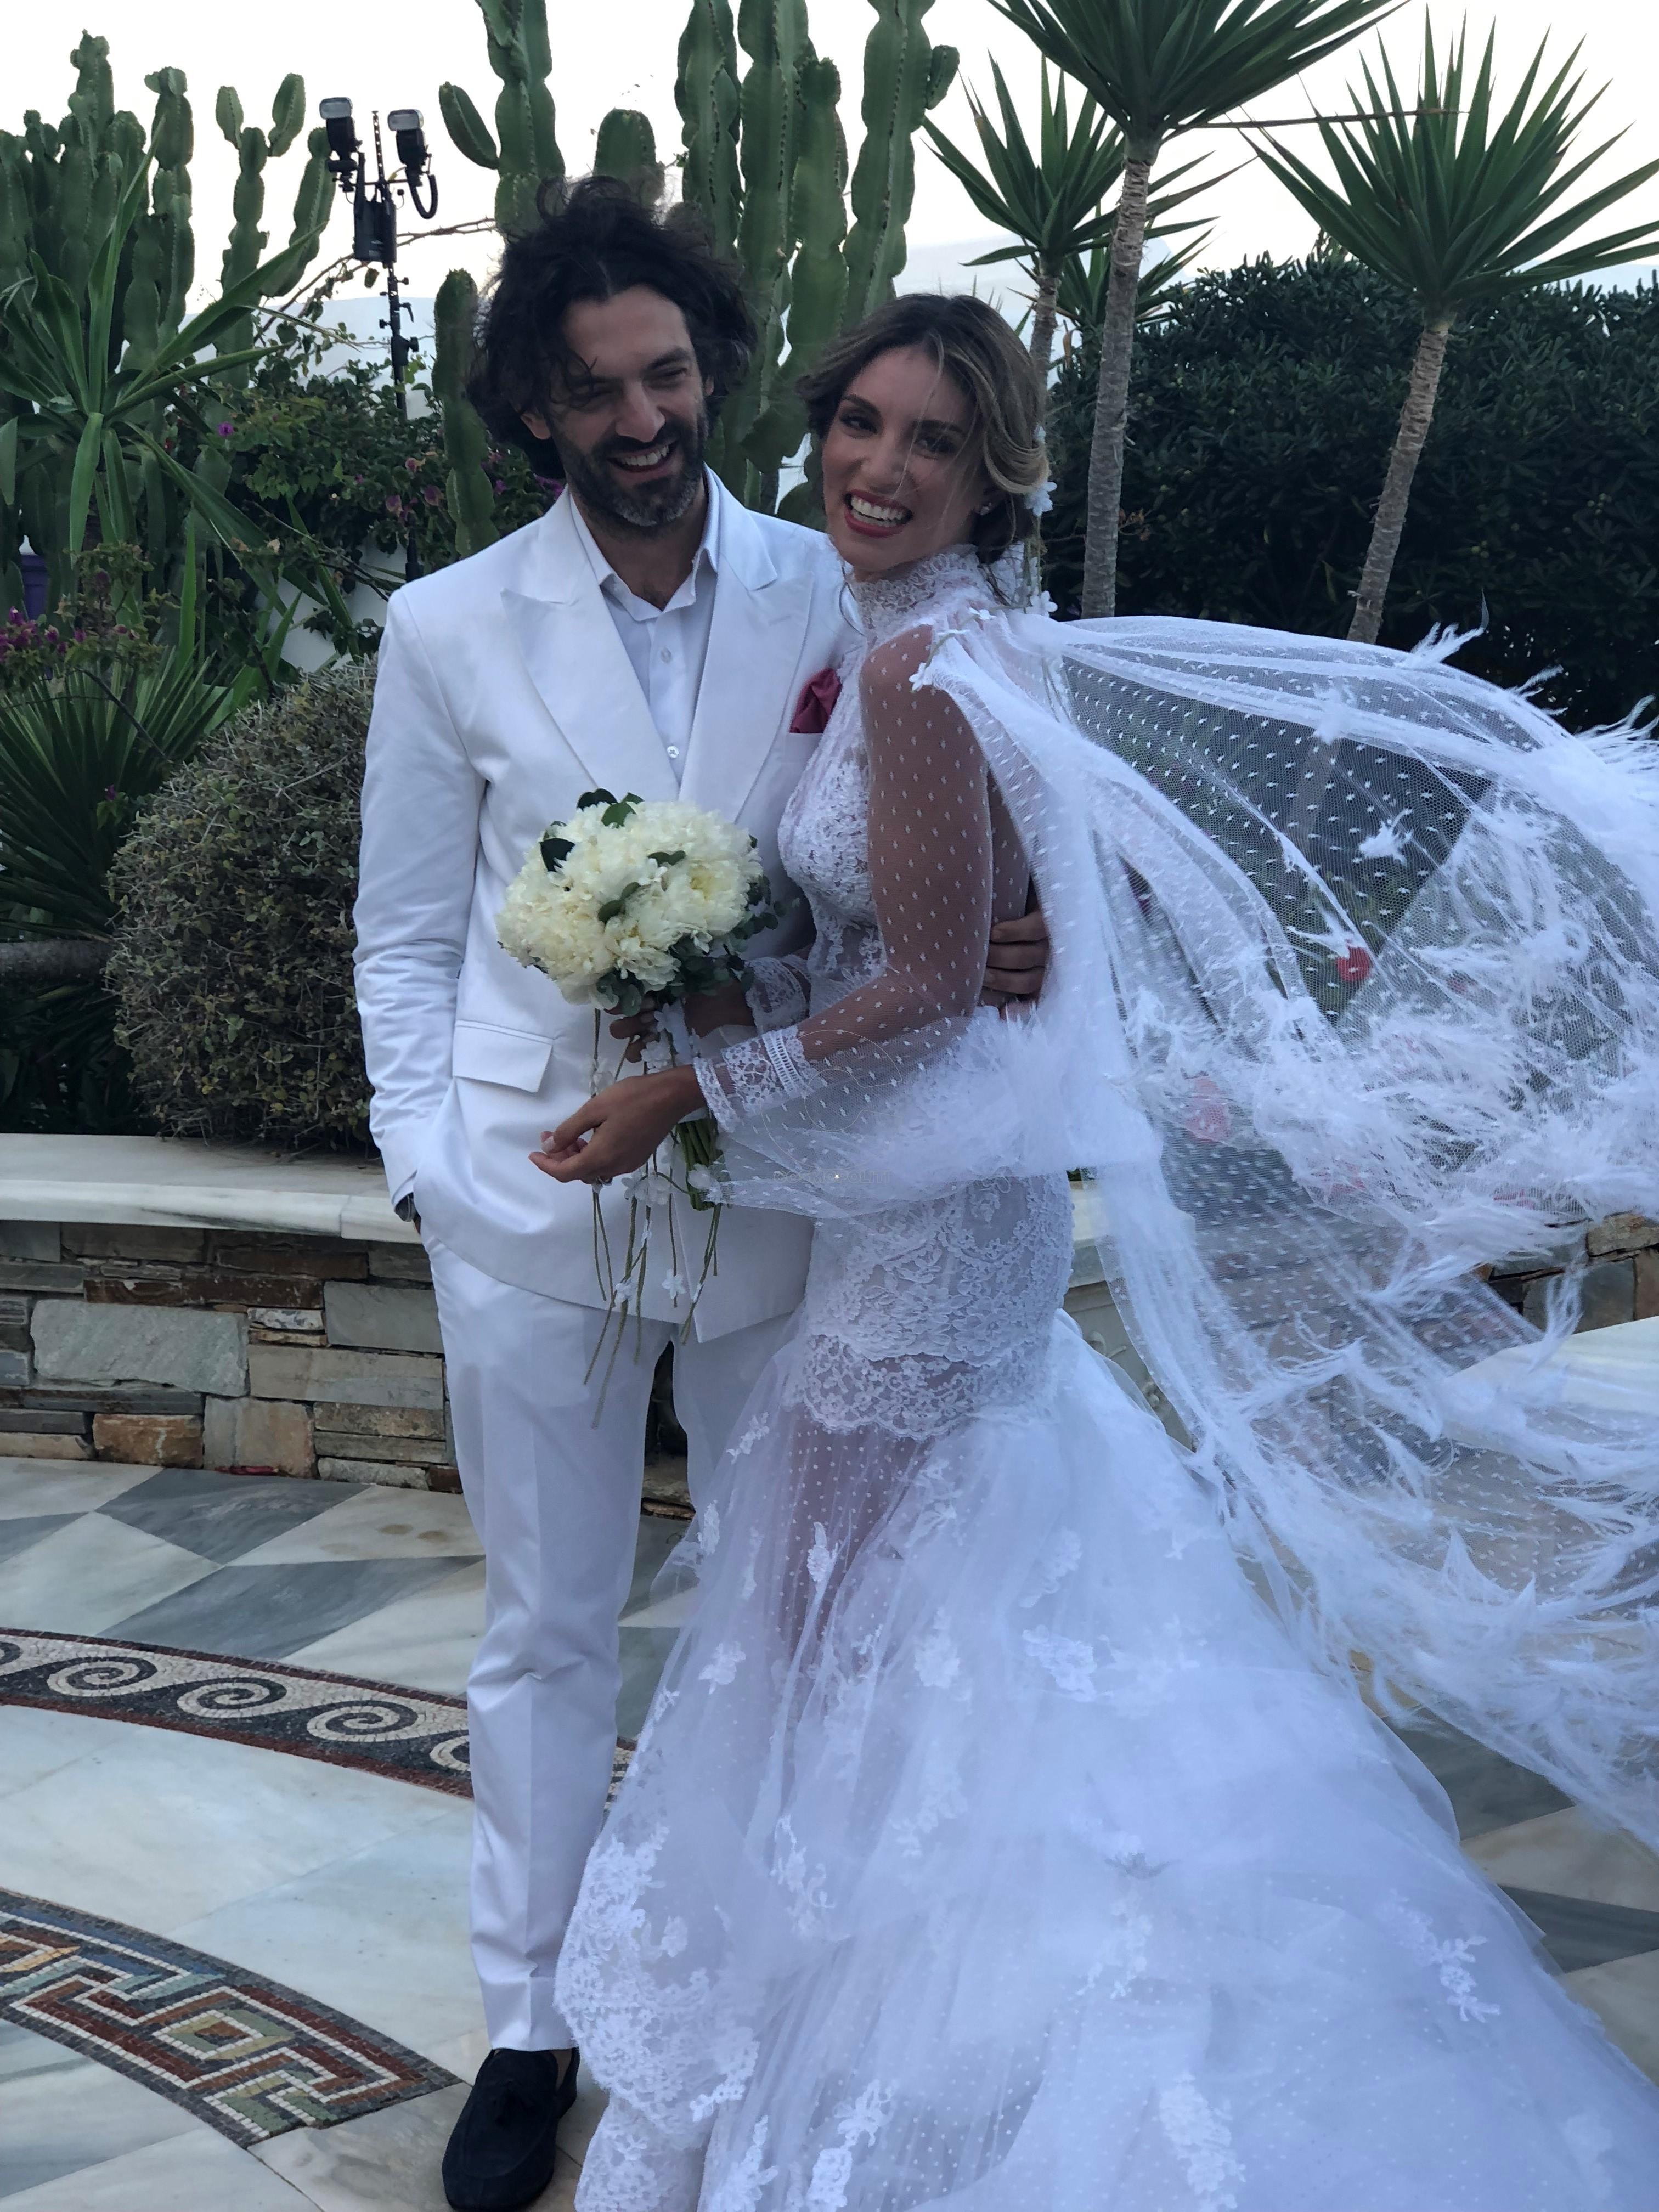 28e2c74017ae Στο after wedding party ήταν εκθαμβωτική με το ολοκέντητο φόρεμα με βαθύ  ντεκολτέ και custom made μεταλλική ζώνη